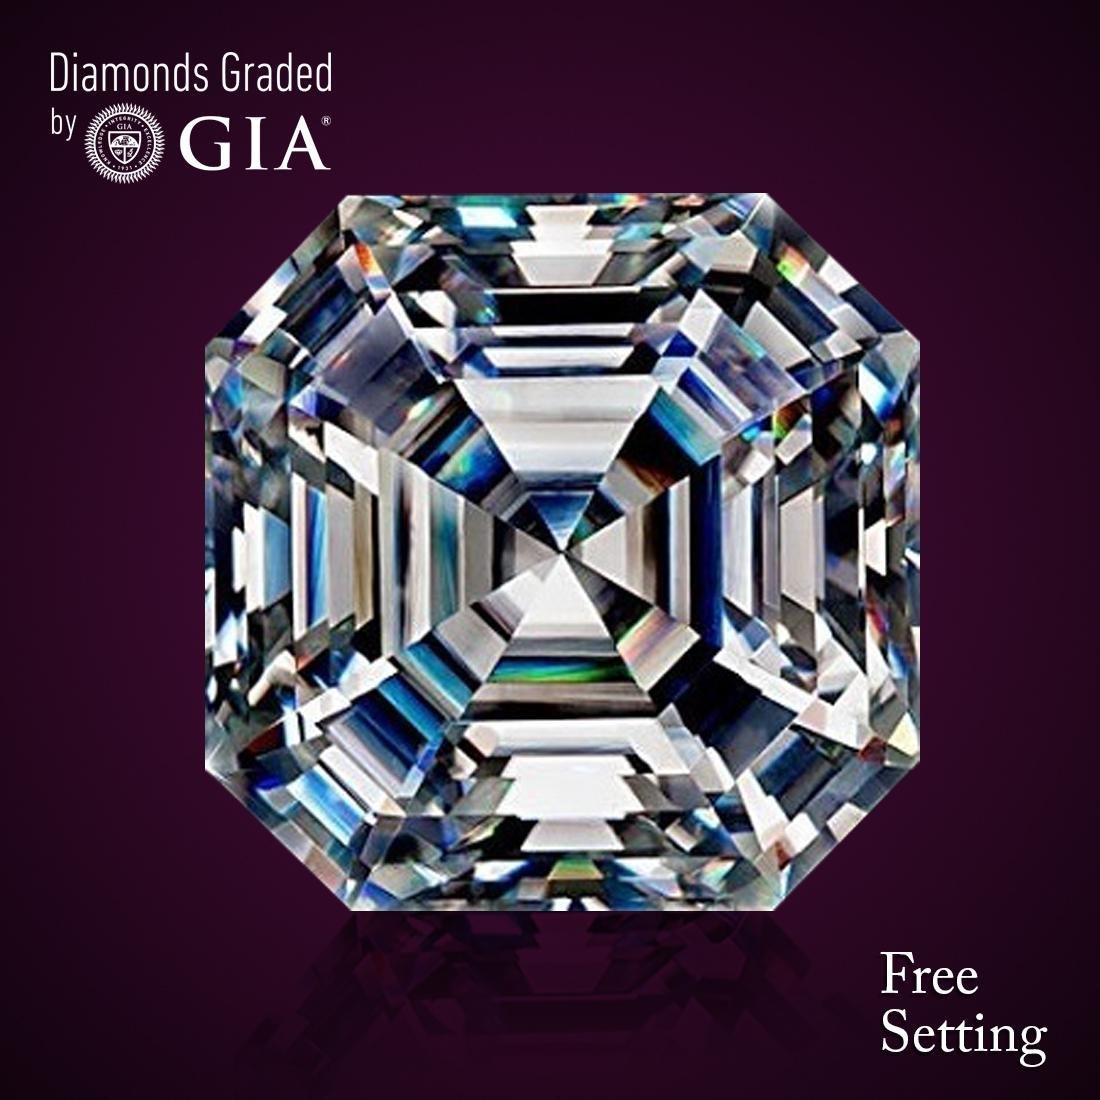 4.51 ct, Color E/VVS2, Sq. Emerald cut Diamond 45% Off